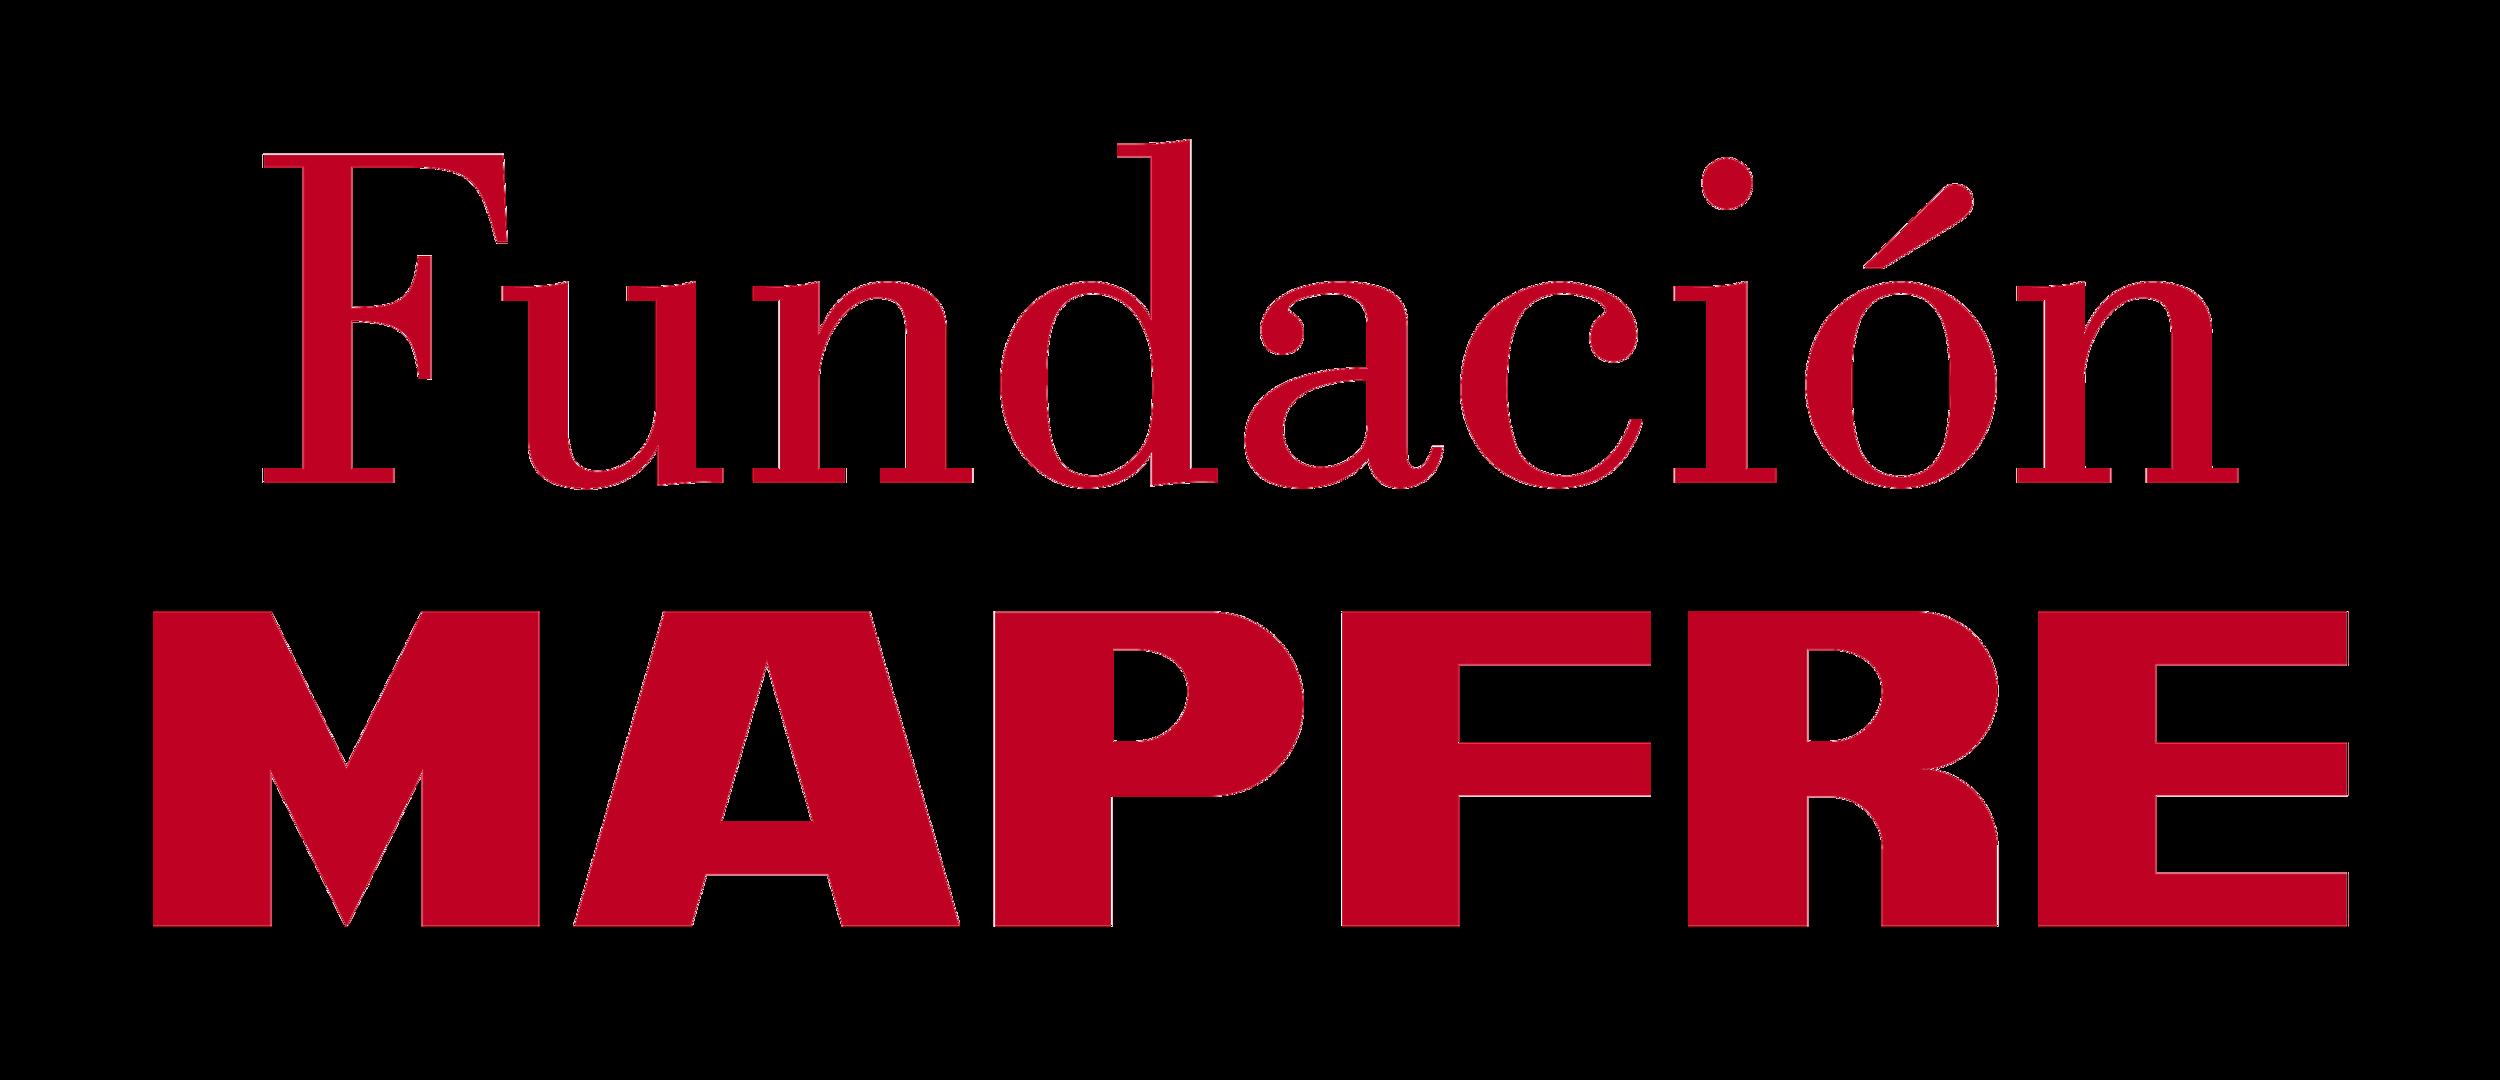 Fundacion-MAPFRE-Logo-Red-TRANS.png